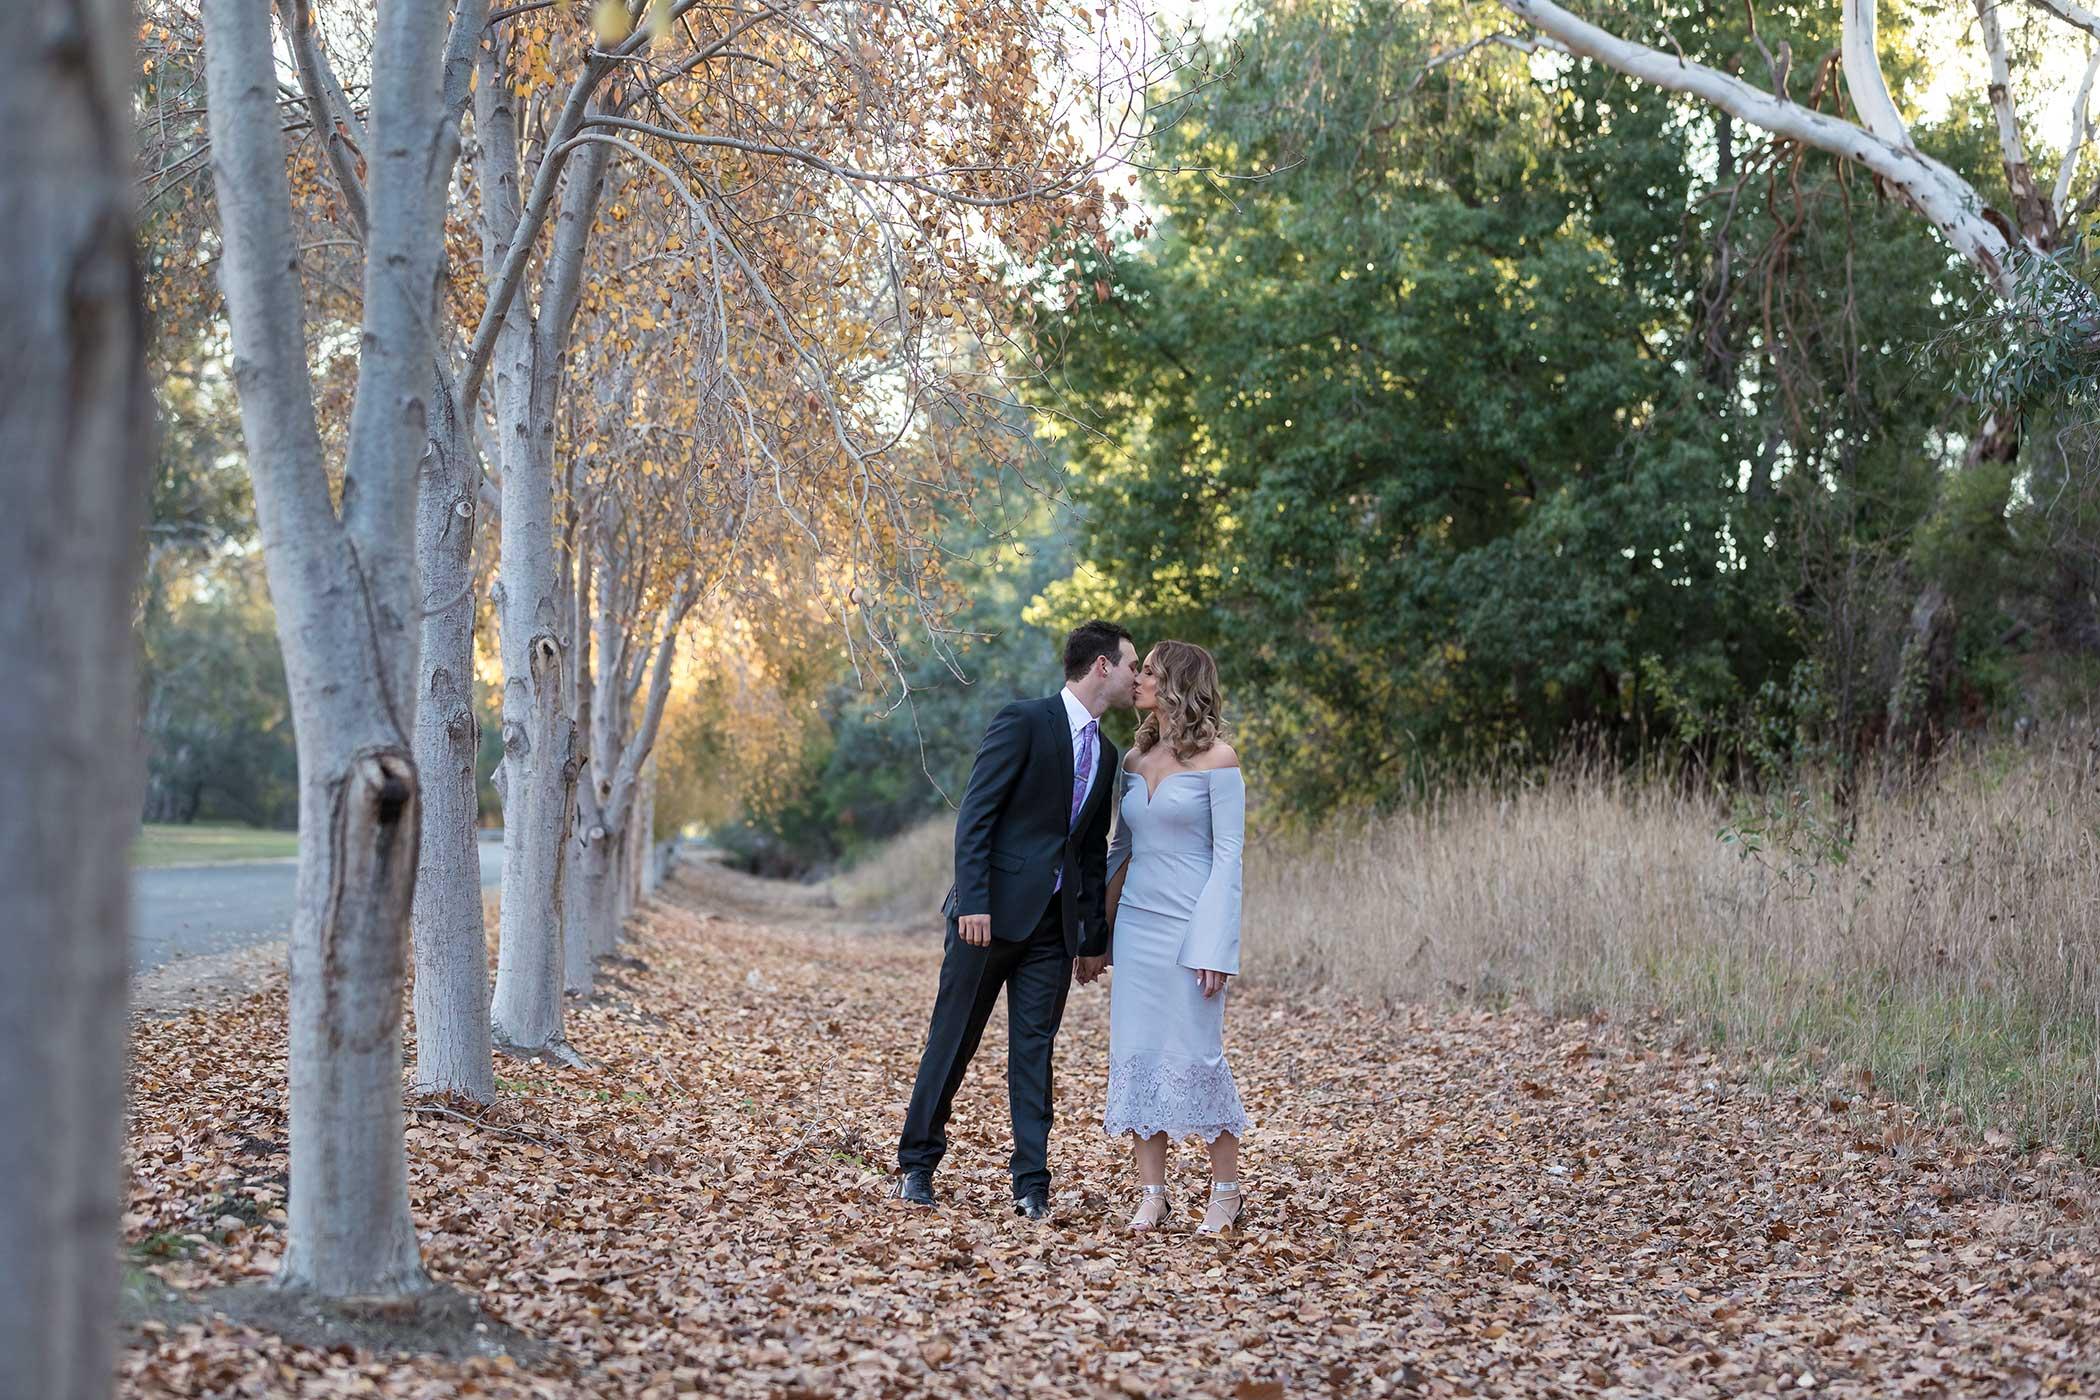 Engagement photography by award winning wedding photographer Jason Robins